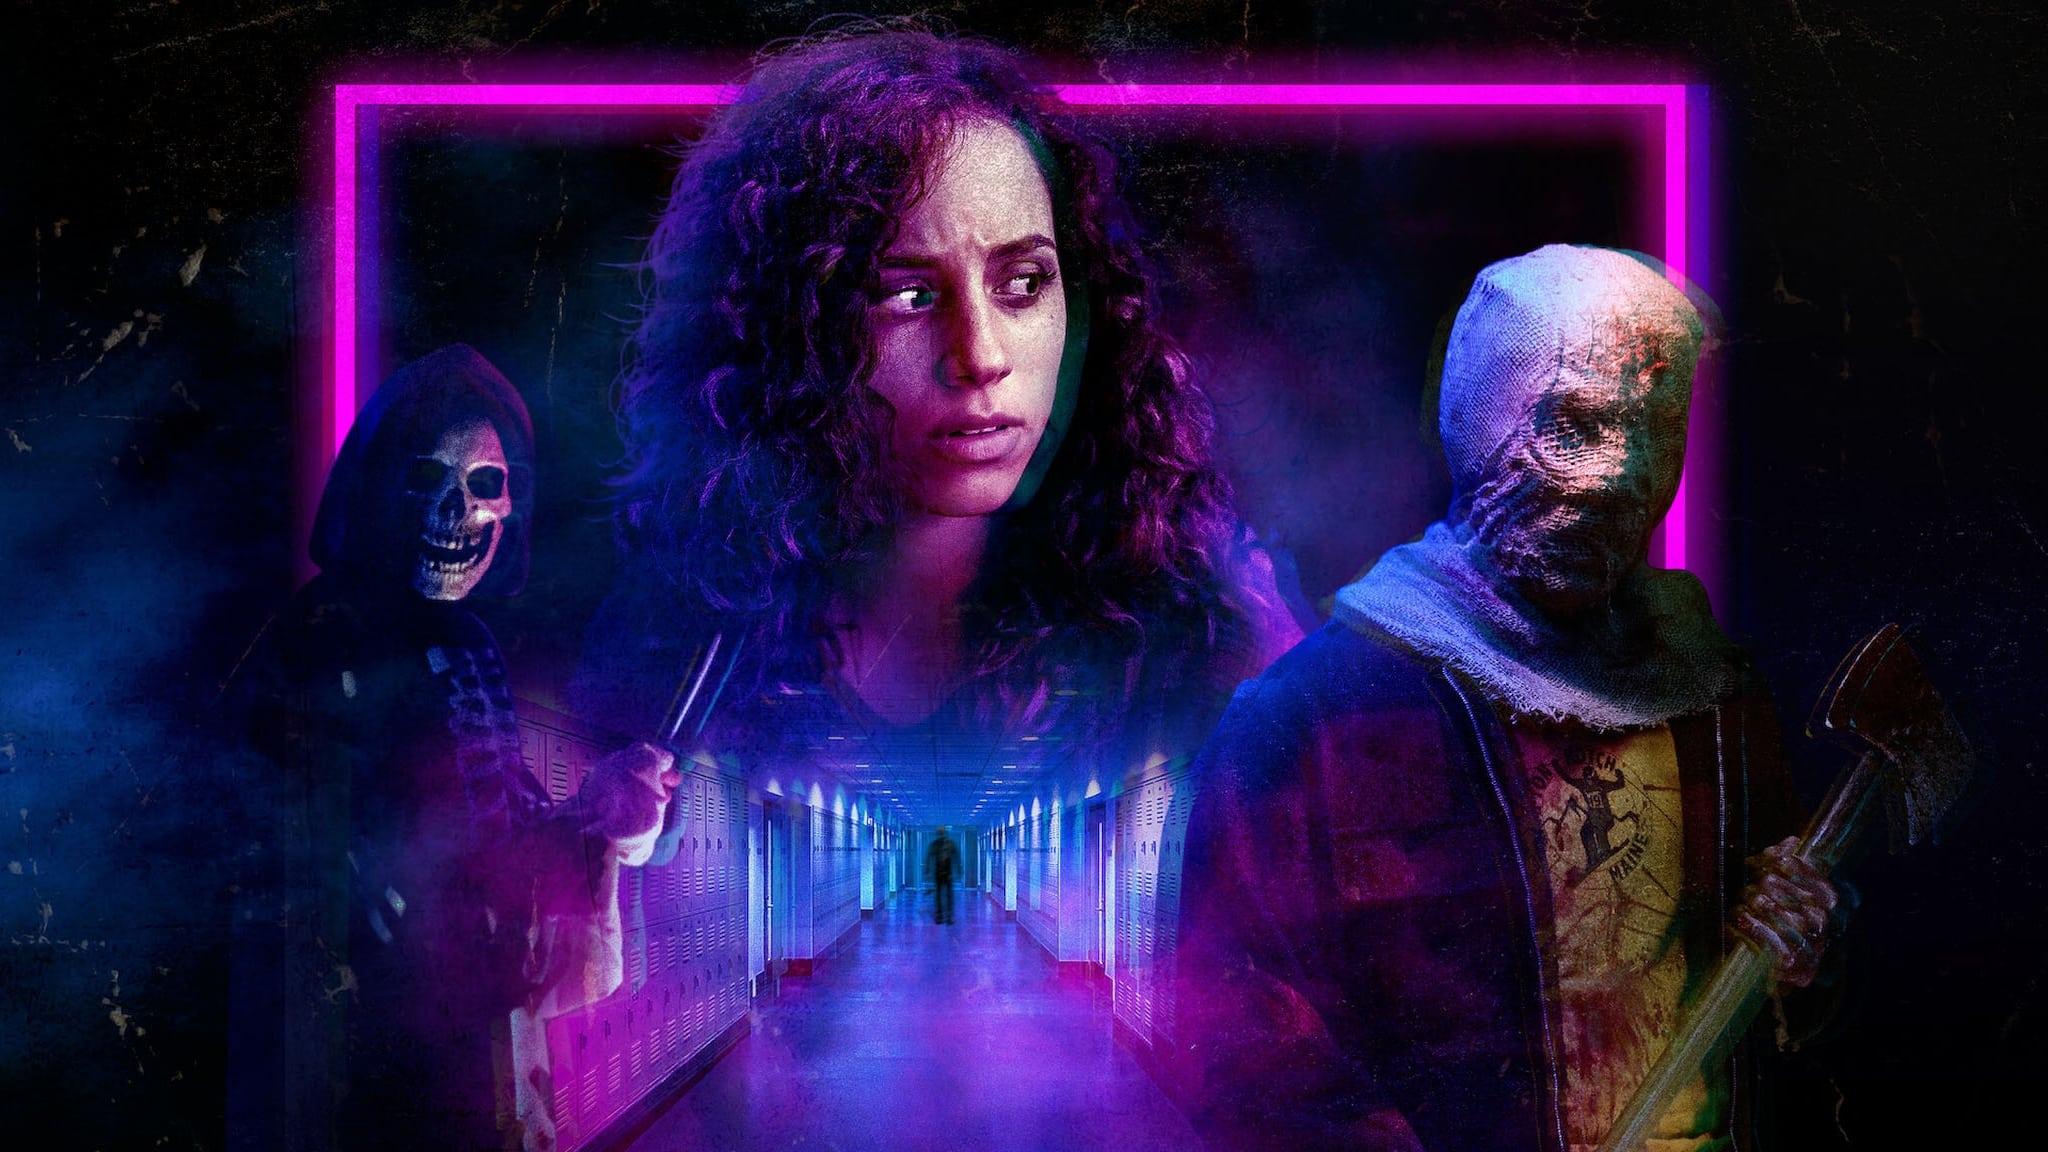 Fear Street: 1994 (2021) English Full Movie Watch Online